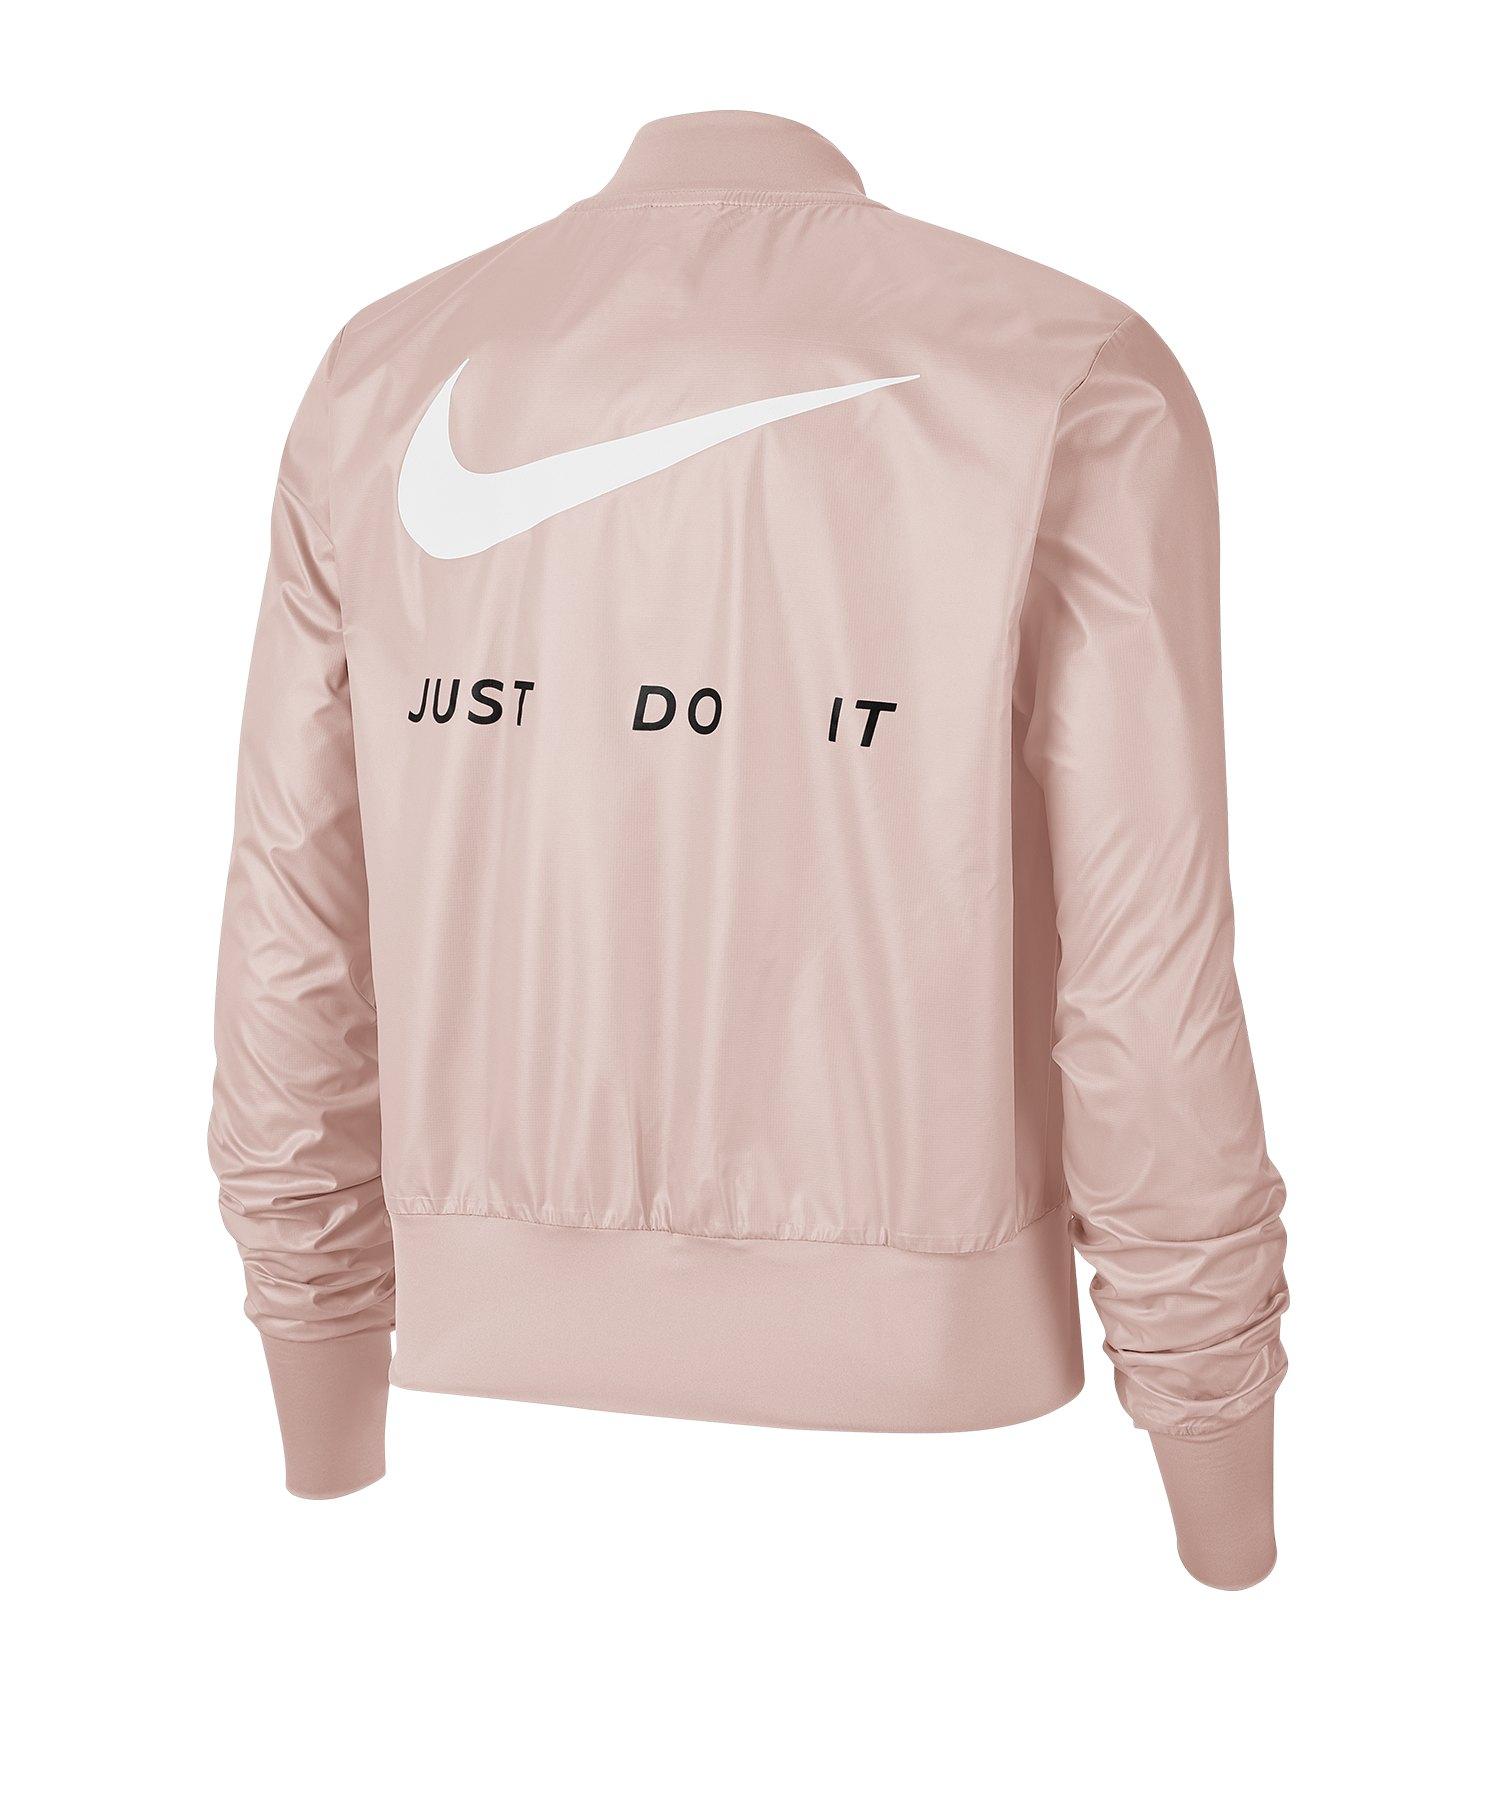 Windjacke Rosa Nike Damen Nike Windjacke Damen Nike Windjacke Rosa Damen 8wn0mN